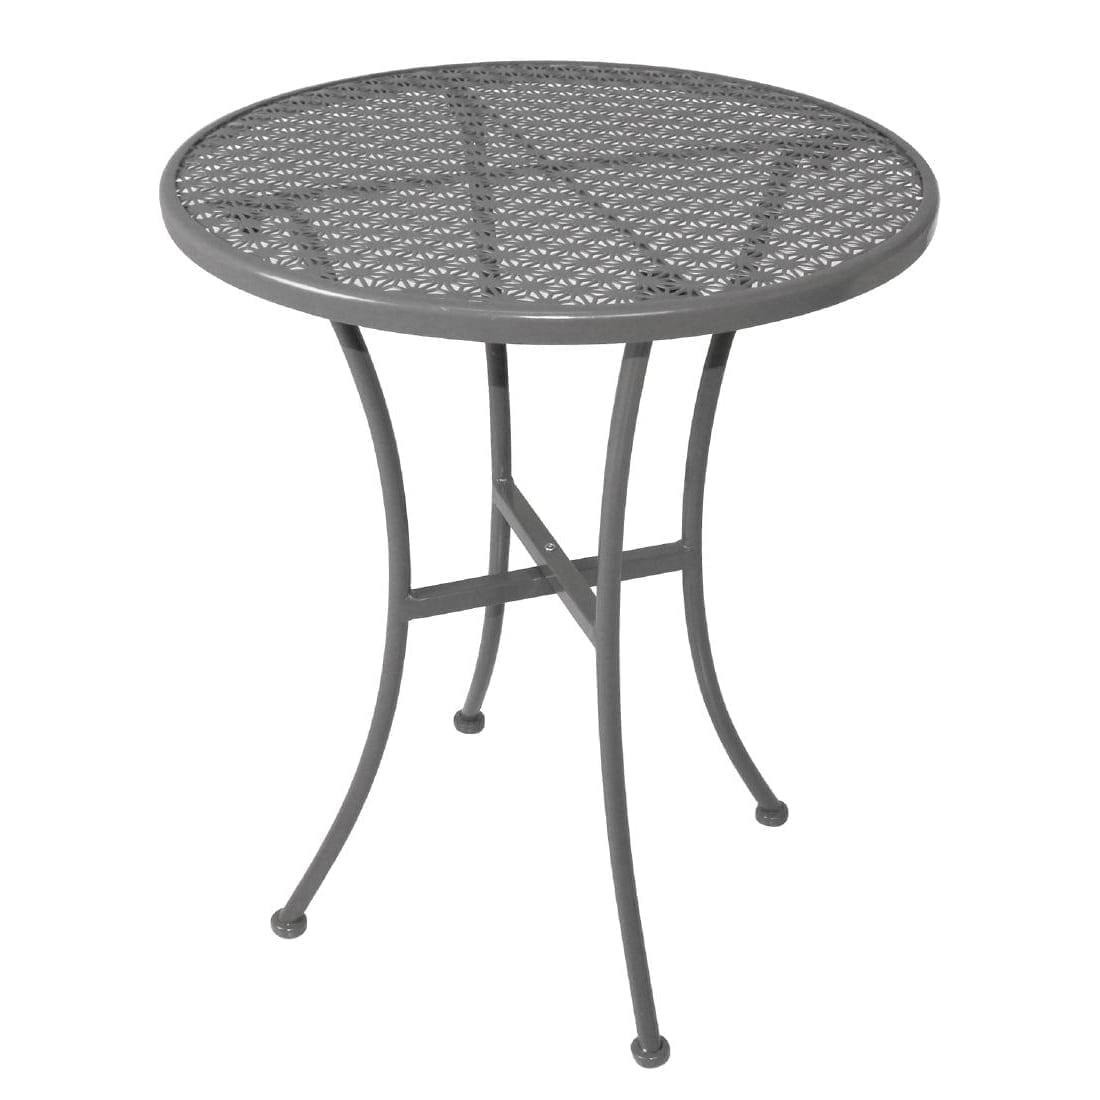 Bolero grey steel patterned bistro table 600mm round loorolls